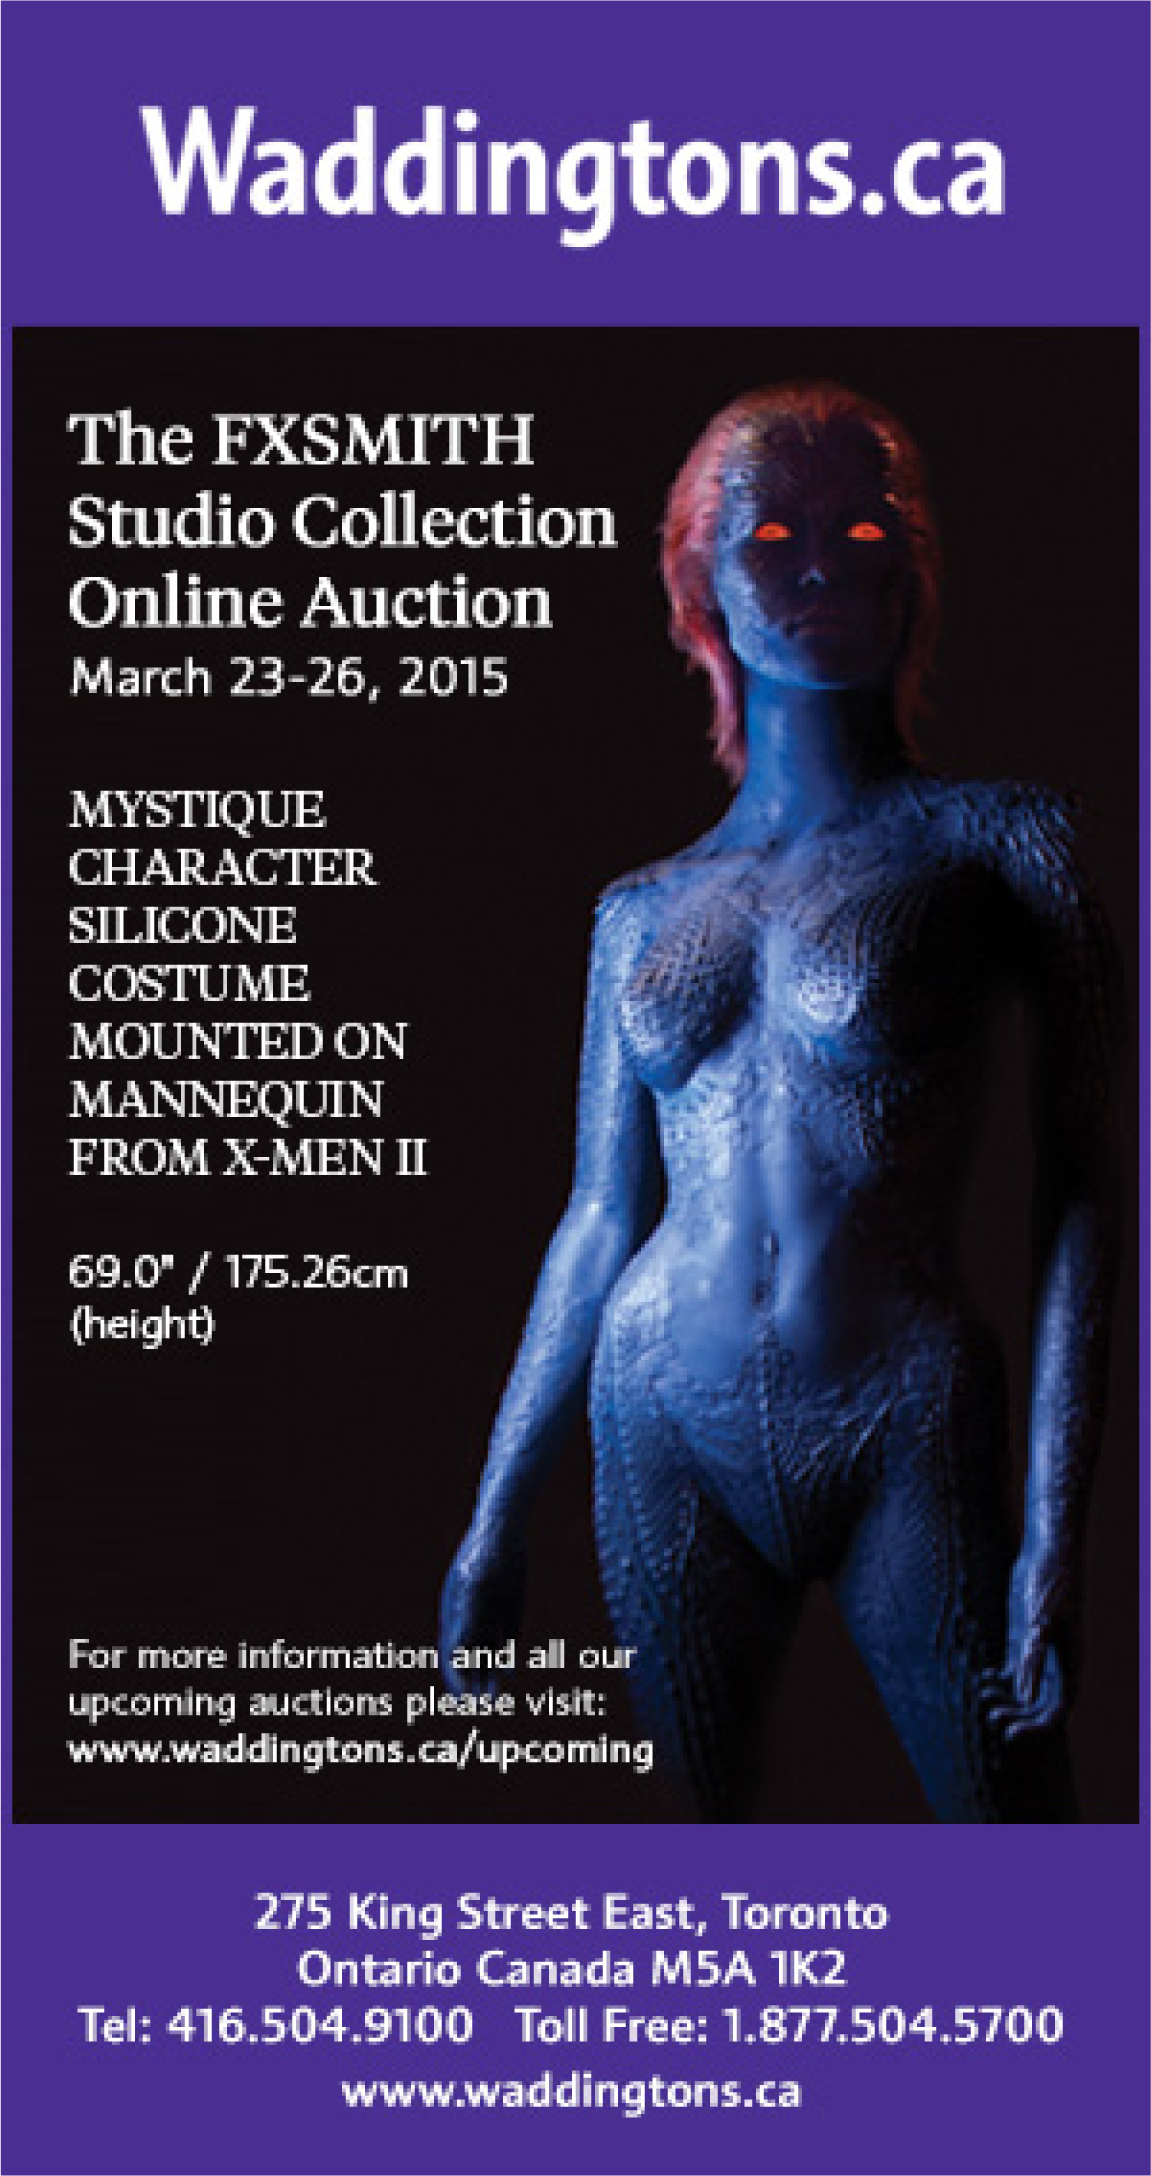 Waddington's FXSMITH Studio Collection Online Auctions